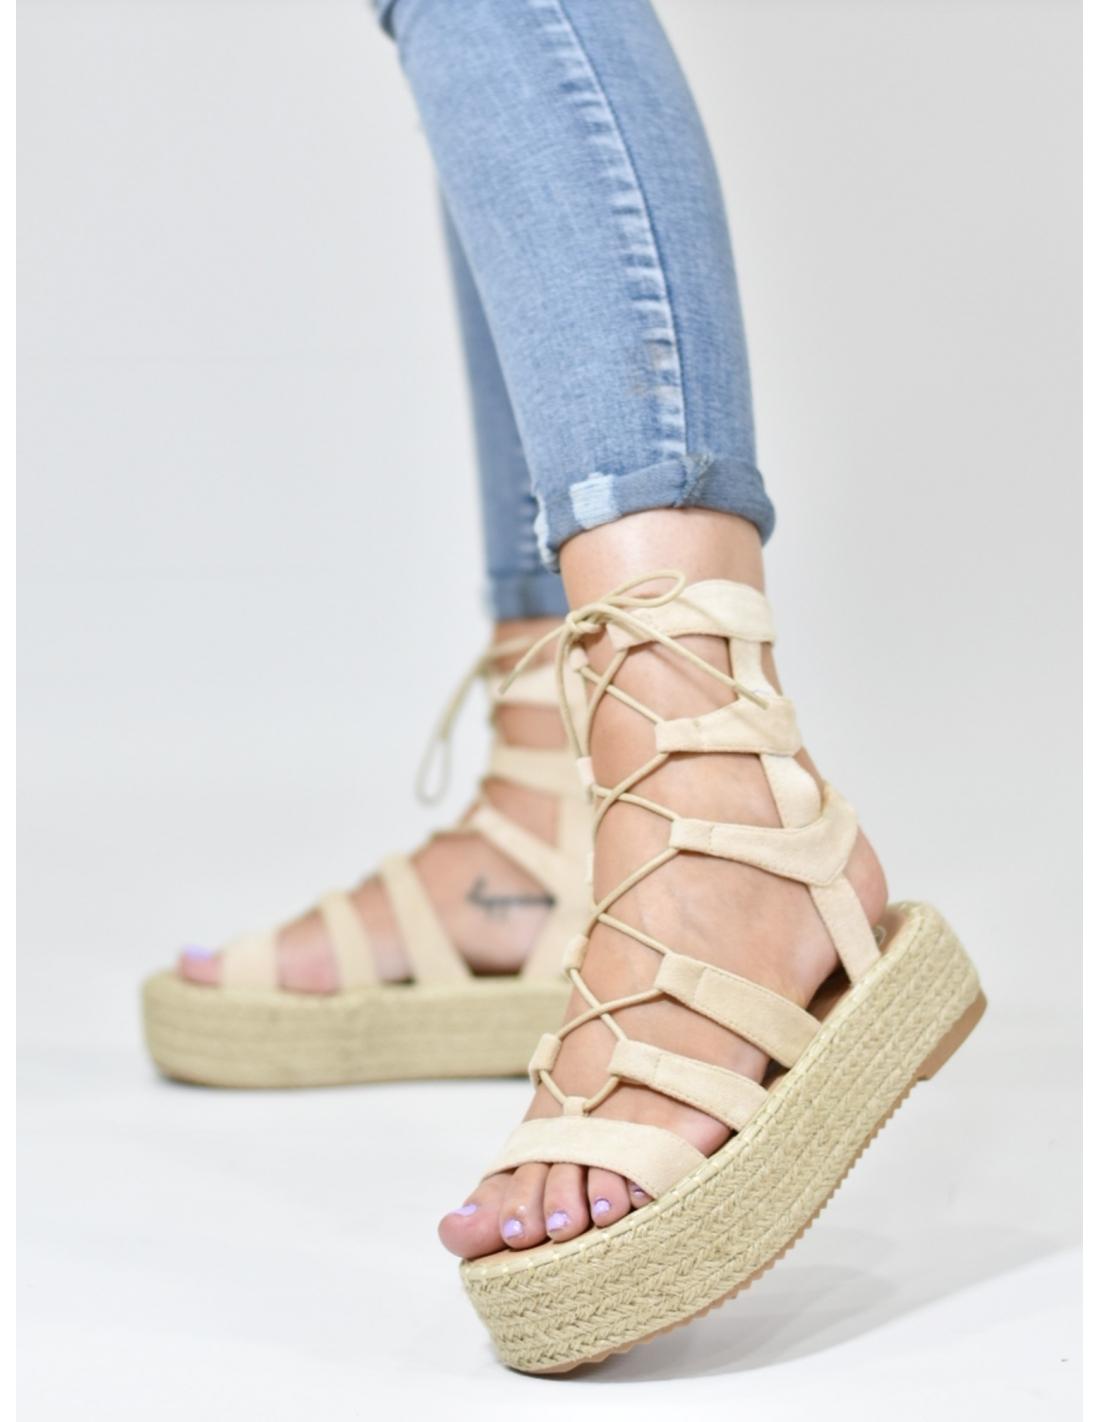 Sandalia romana beige